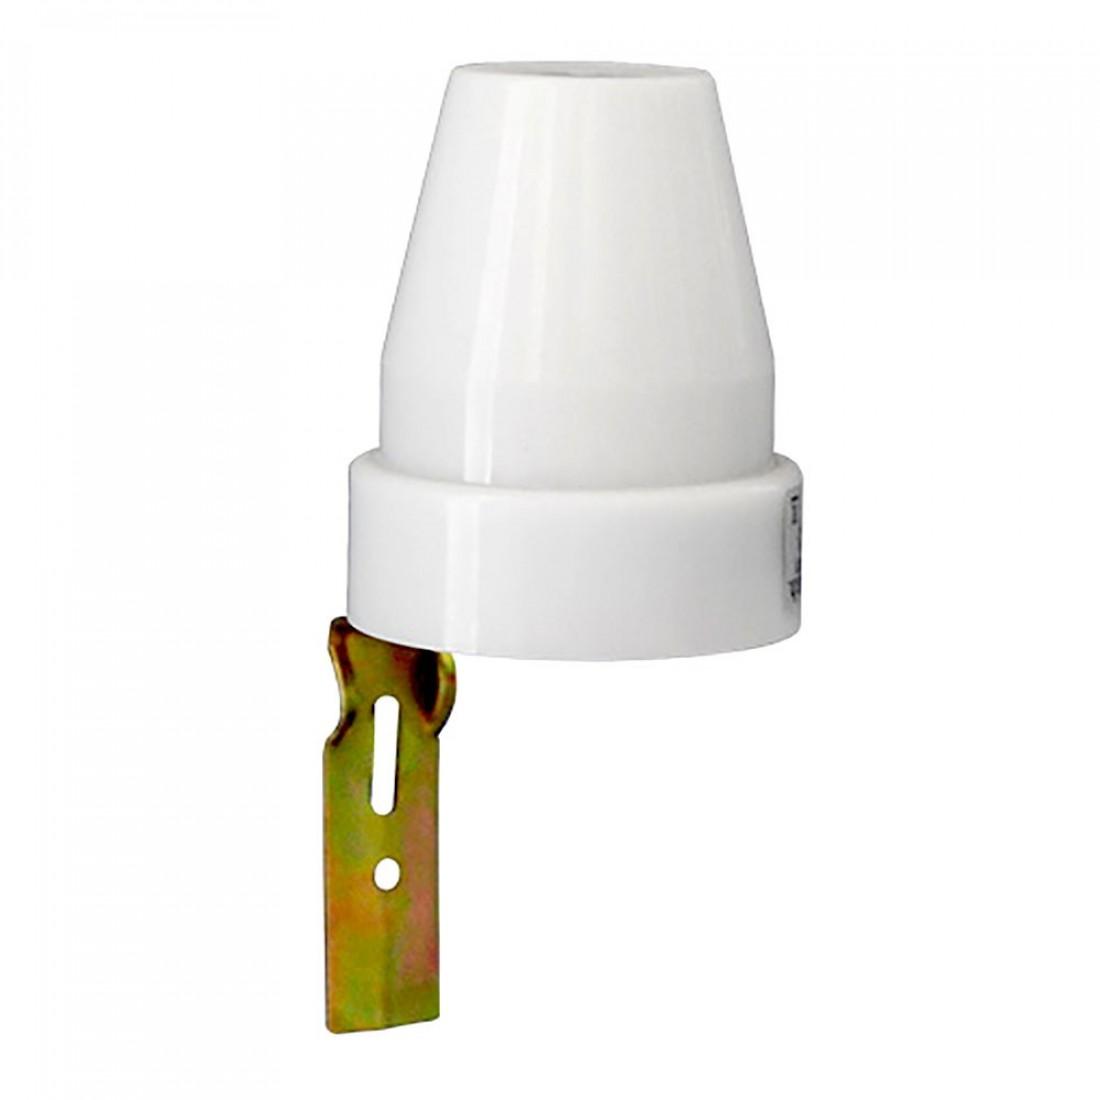 цена метр фотореле для светодиодного светильника Райт